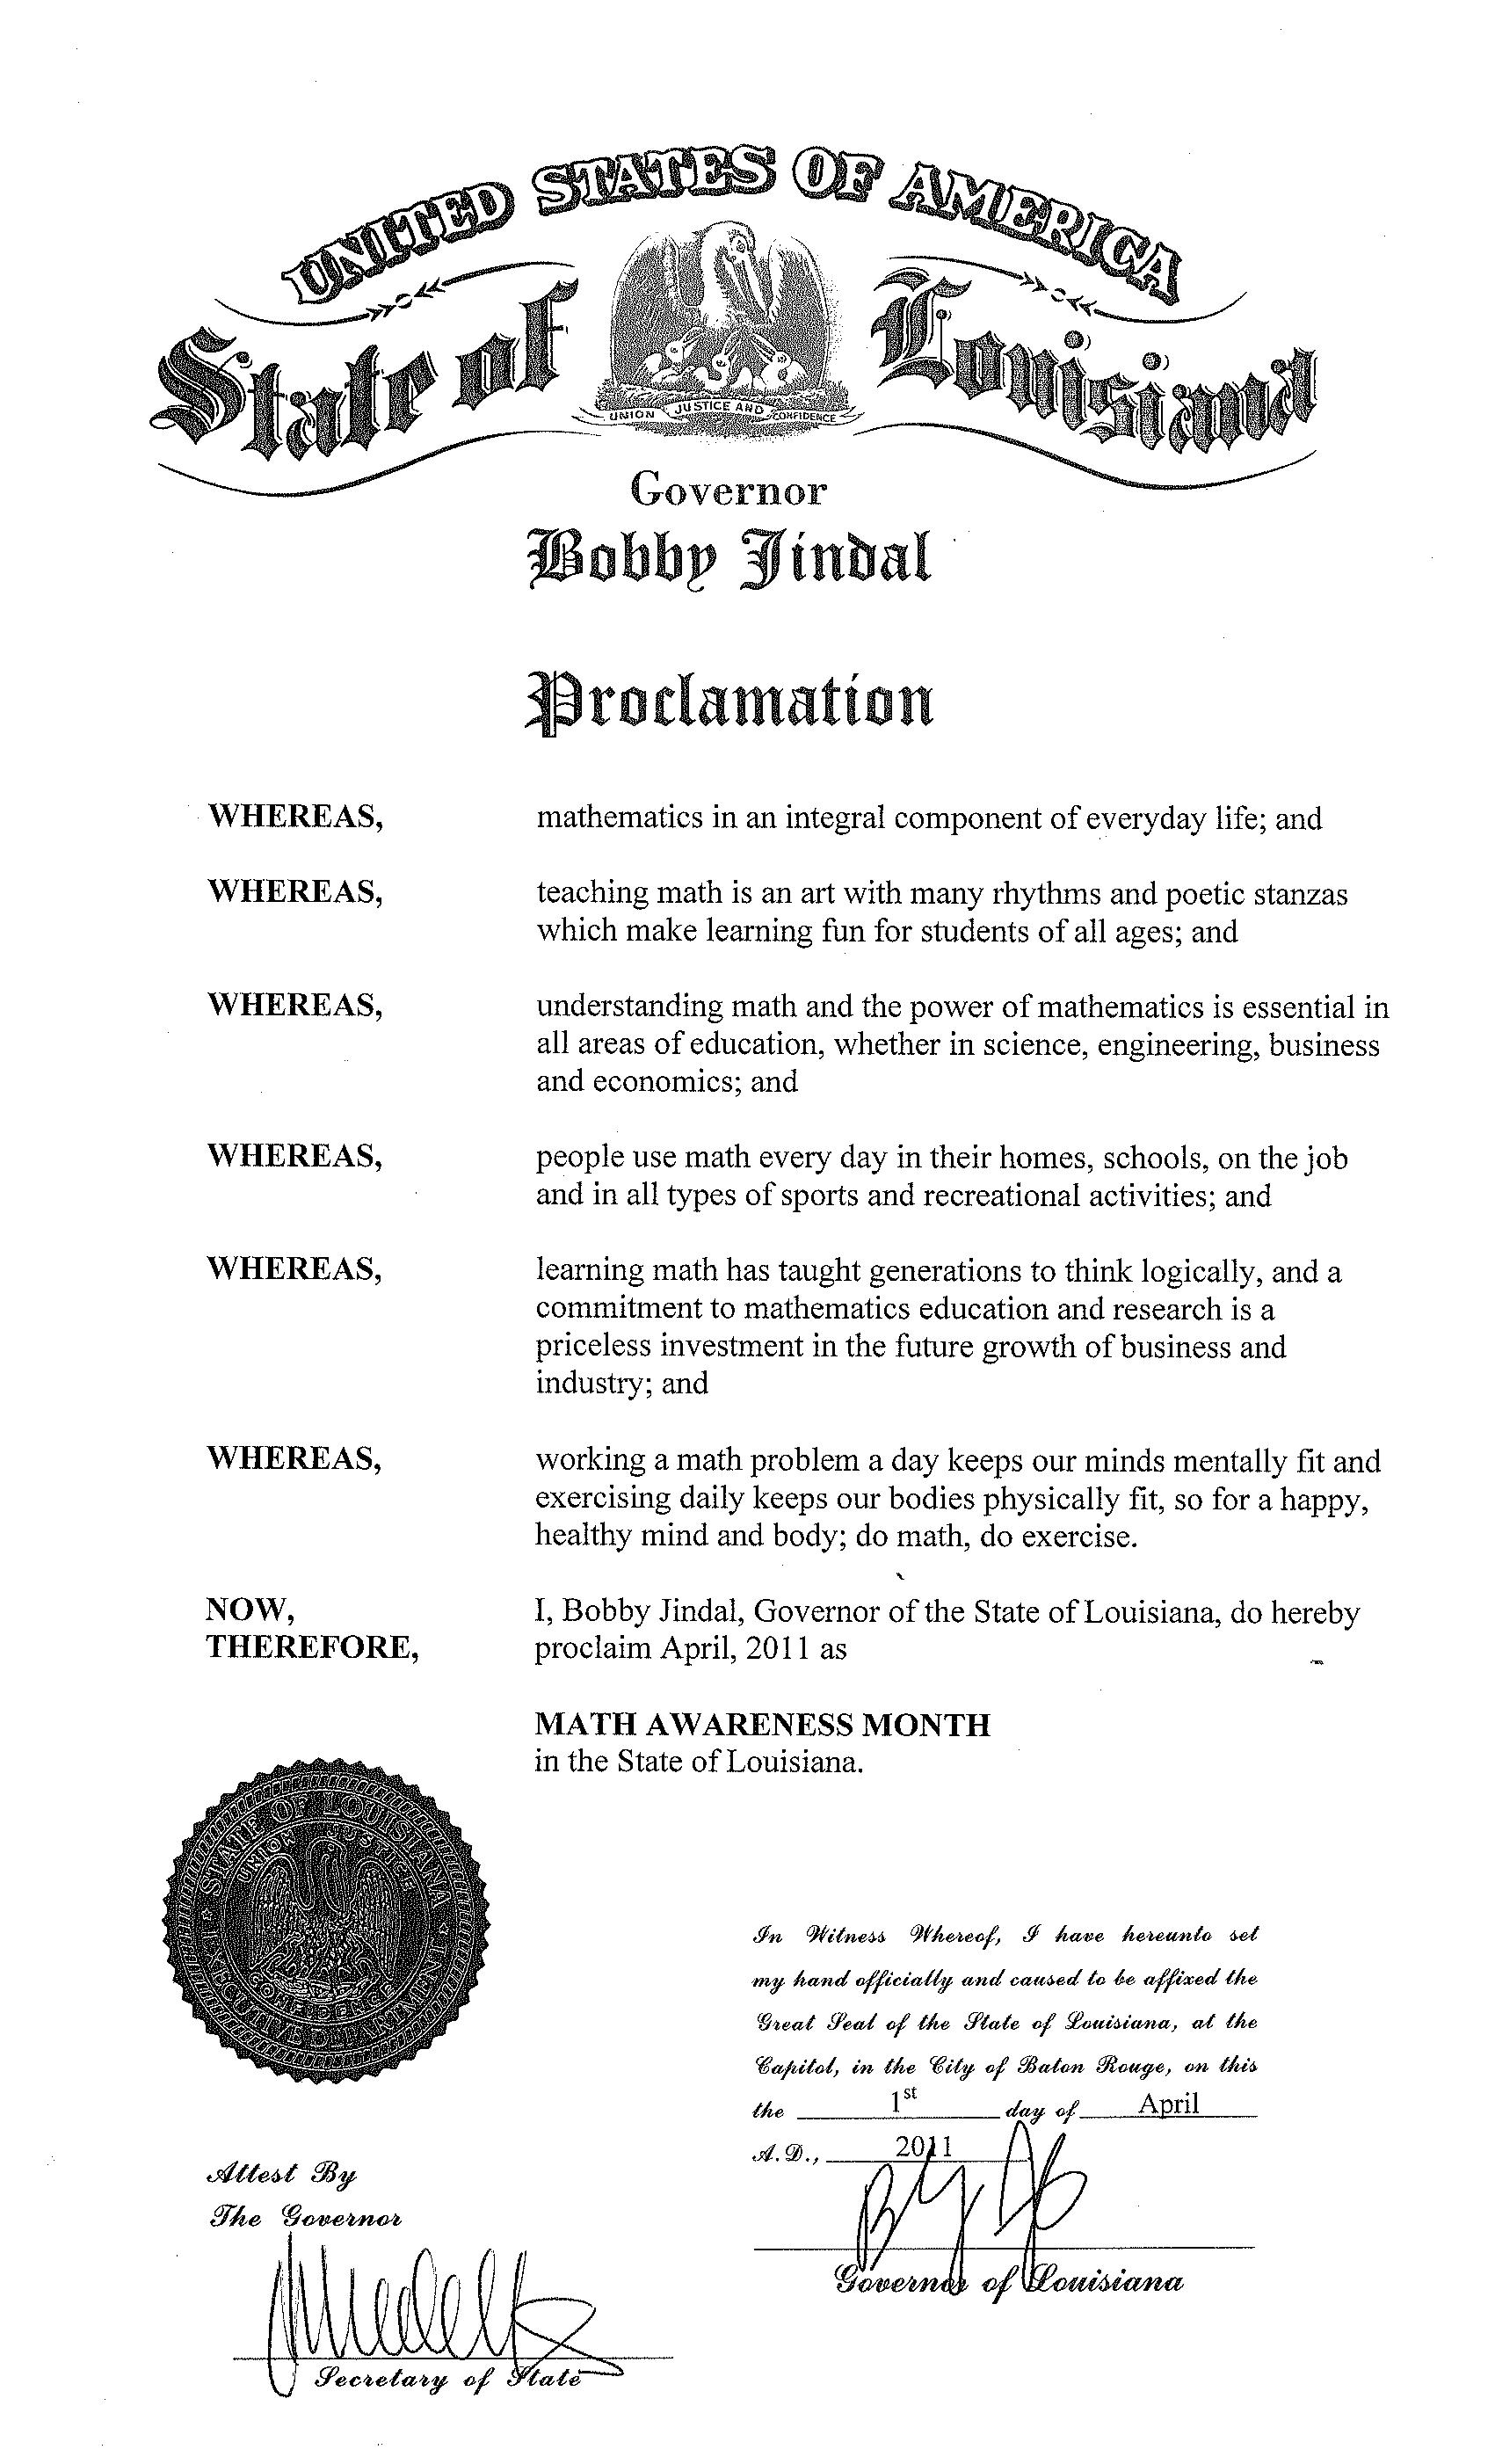 Math Awareness Month Proclamation